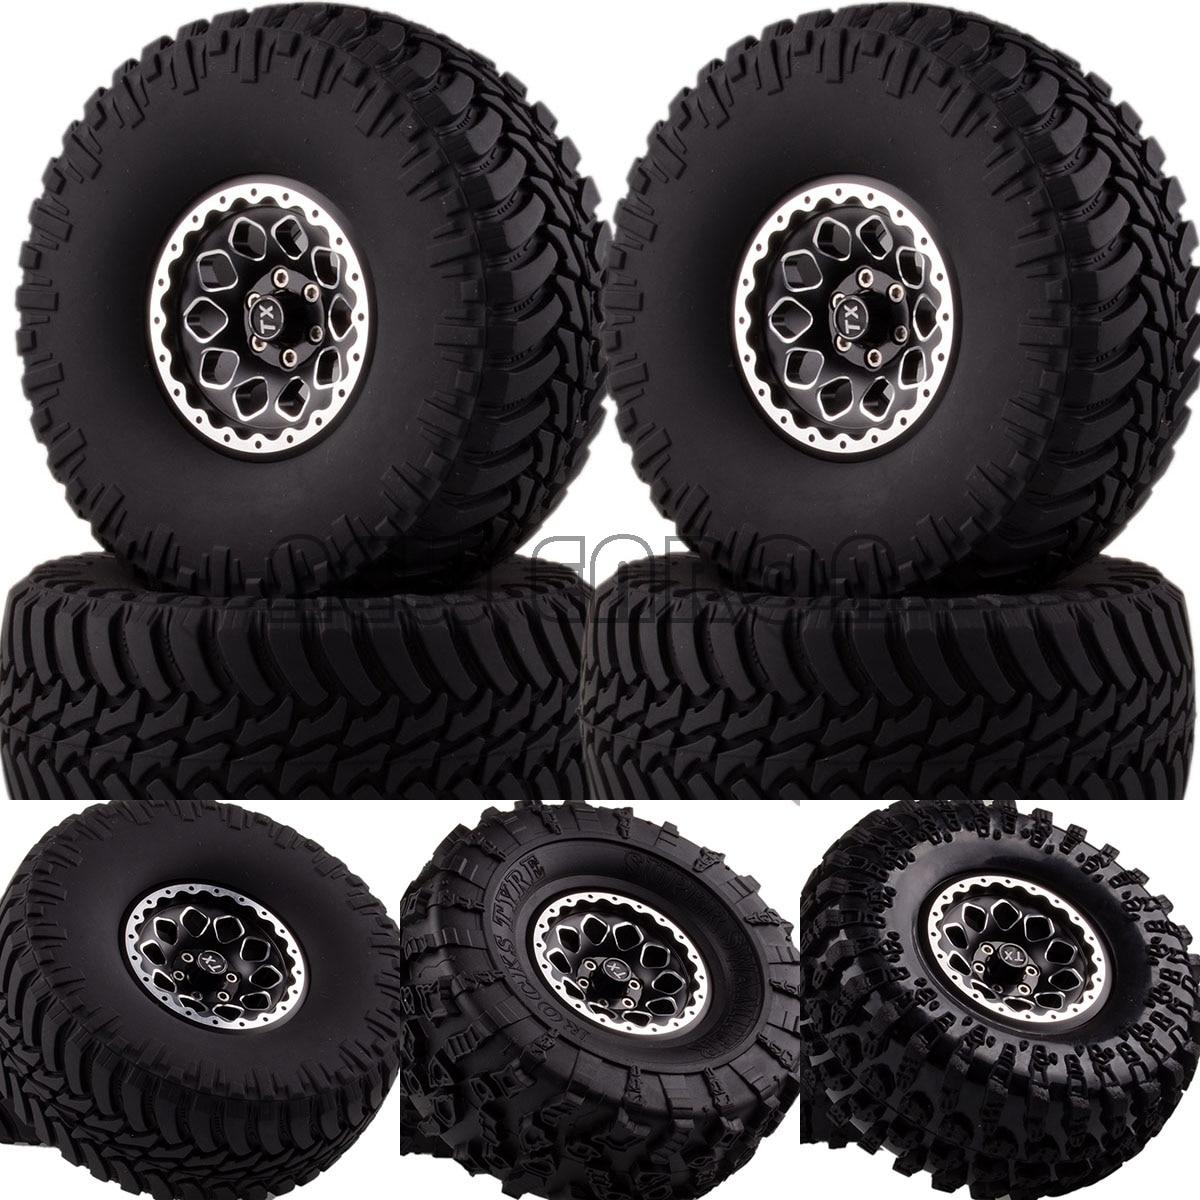 NEW ENRON 1:10 SET 2.2 Beadlock Wheels & Tires 2021 FOR 1/10 Crawler AXIAL Traxxas Tamiya HPI mxfans rc 1 10 2 2 crawler car inflatable tires black alloy beadlock pack of 4